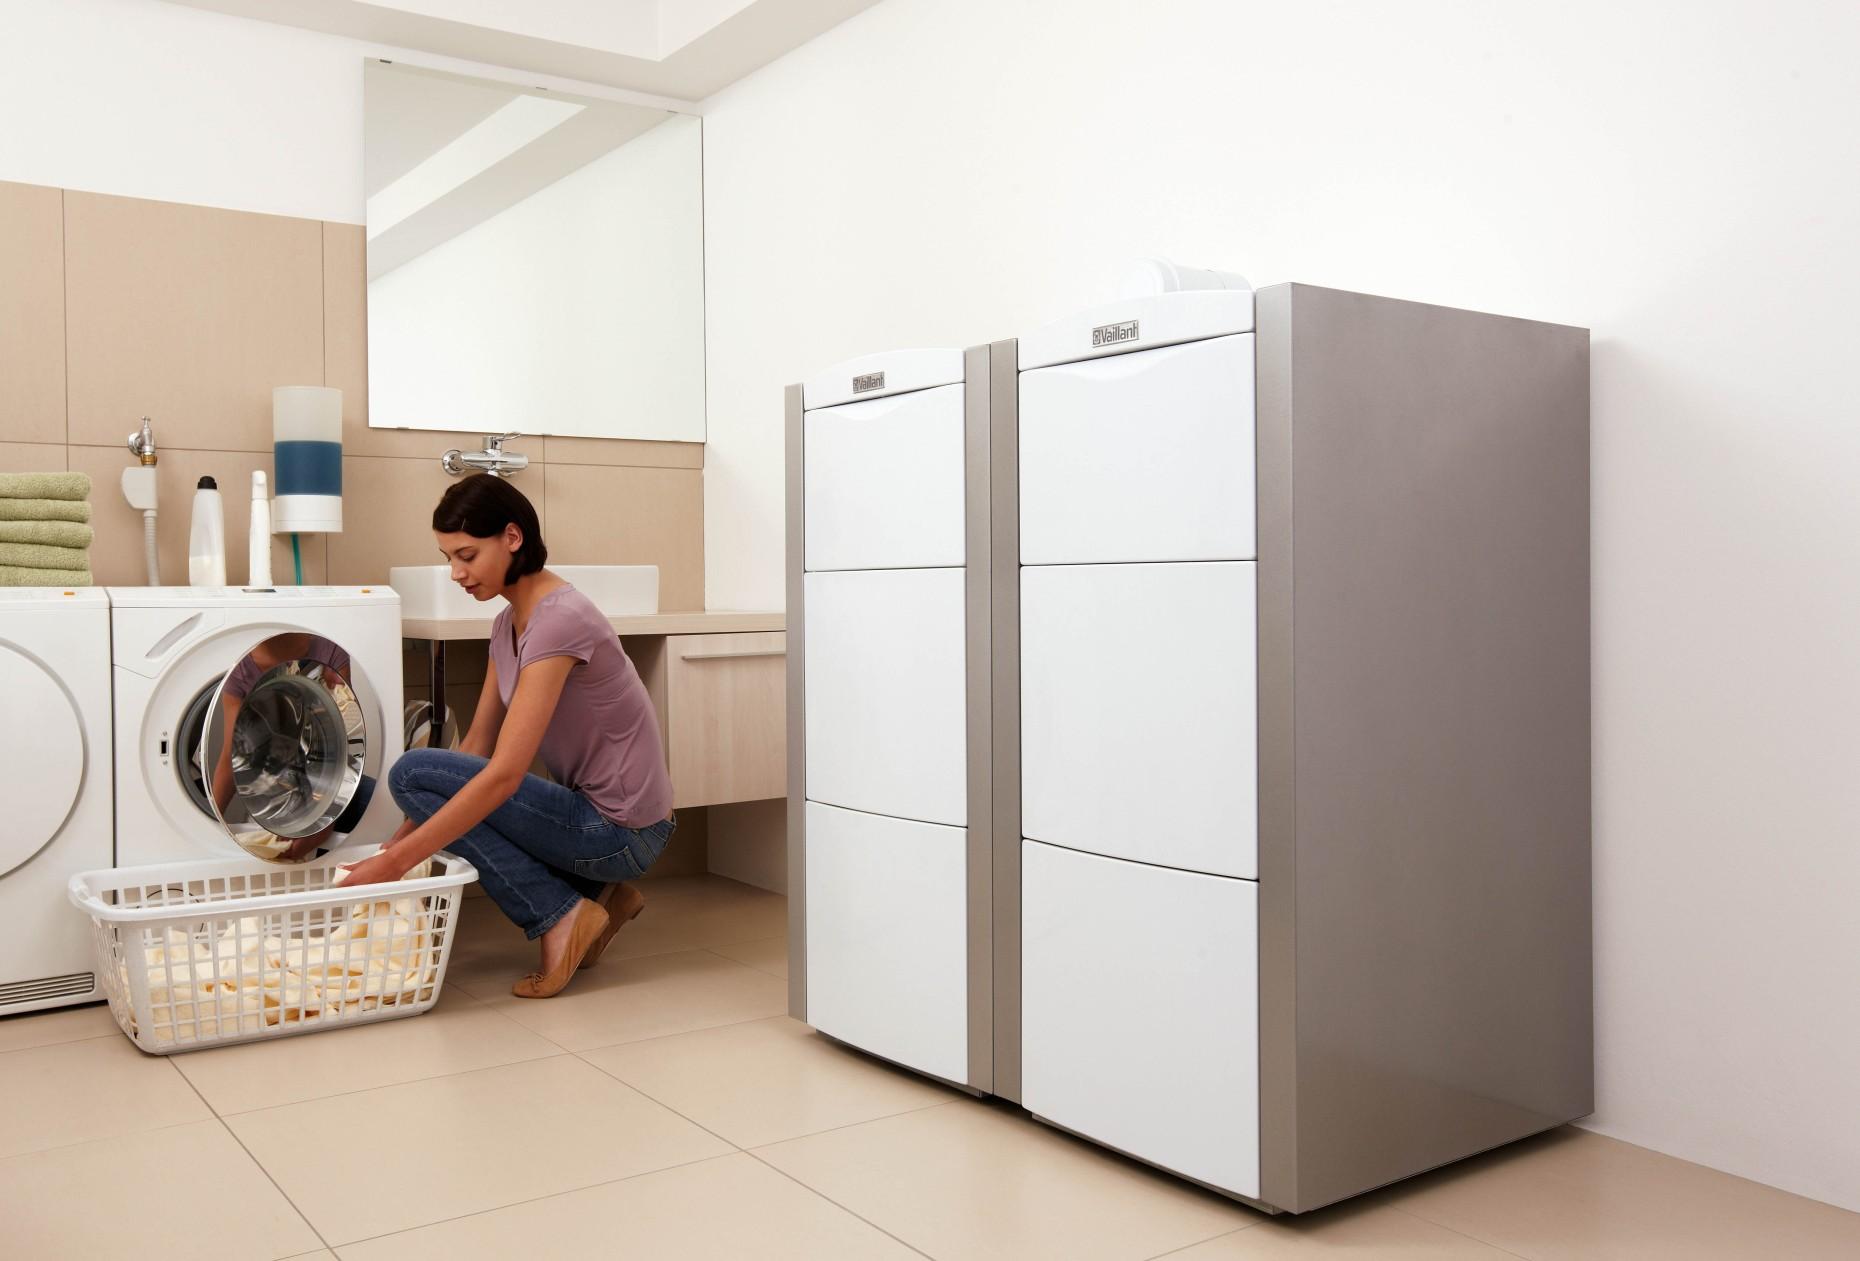 warmwasserspeicher actostor vih k 300 vaillant. Black Bedroom Furniture Sets. Home Design Ideas